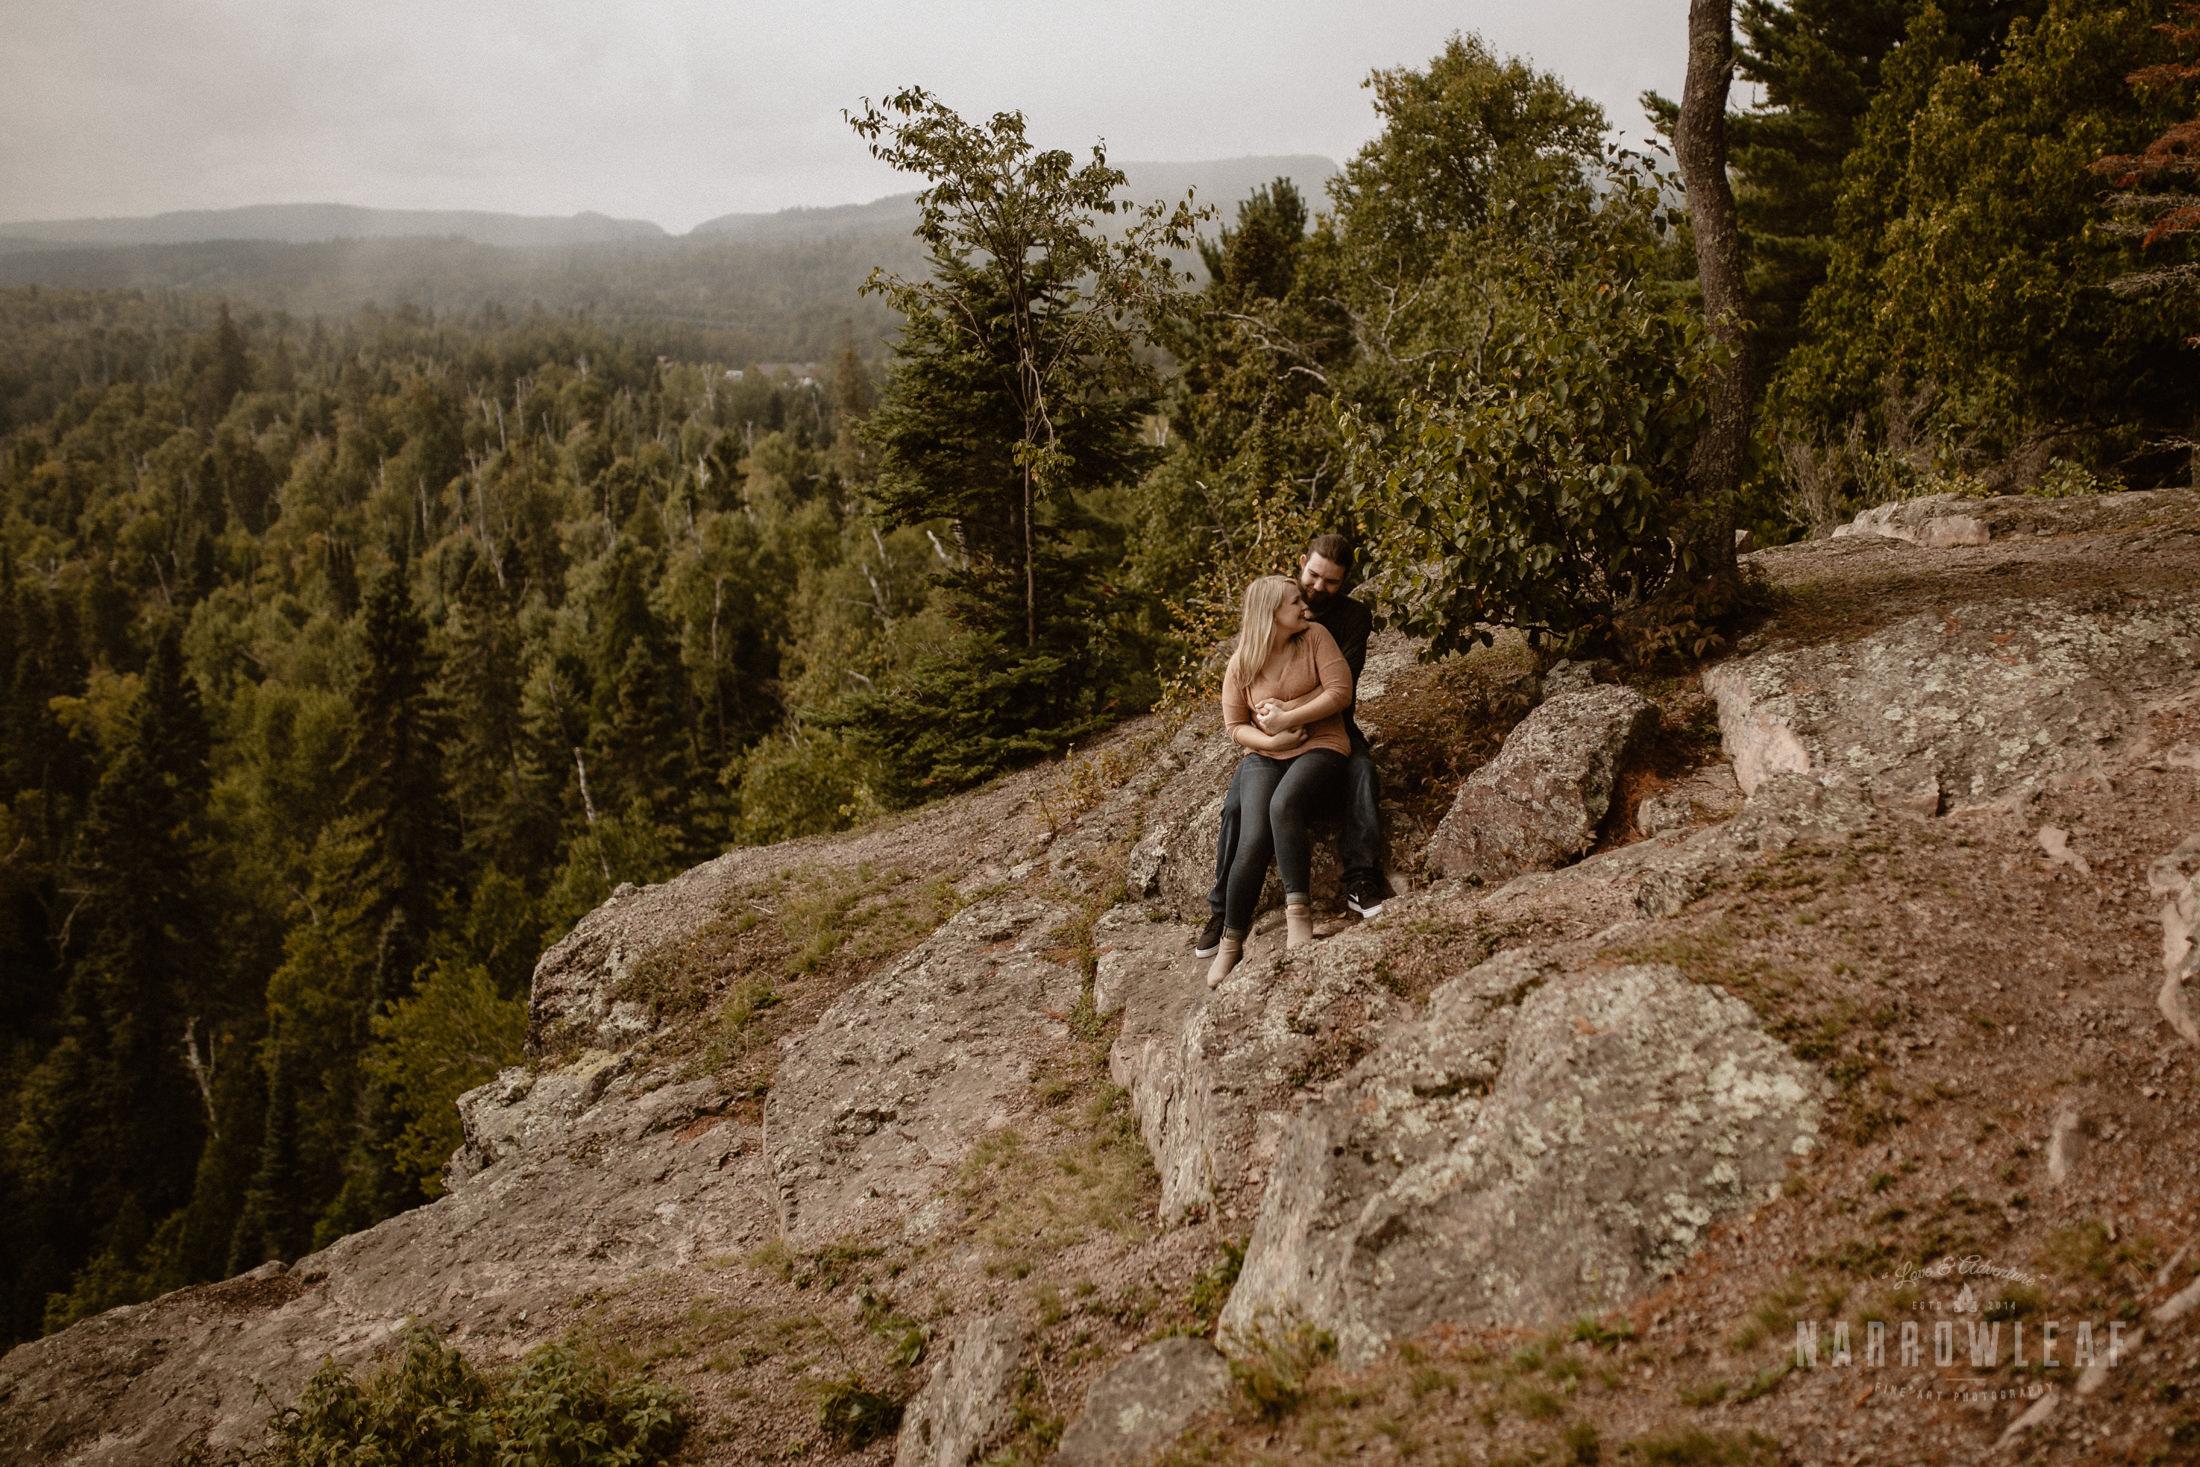 Minnesota-Hiking-Engagement-Photographer-Narrowleaf_Love_and_Adventure_Photography-Tettegouche-State-Park-6167.jpg